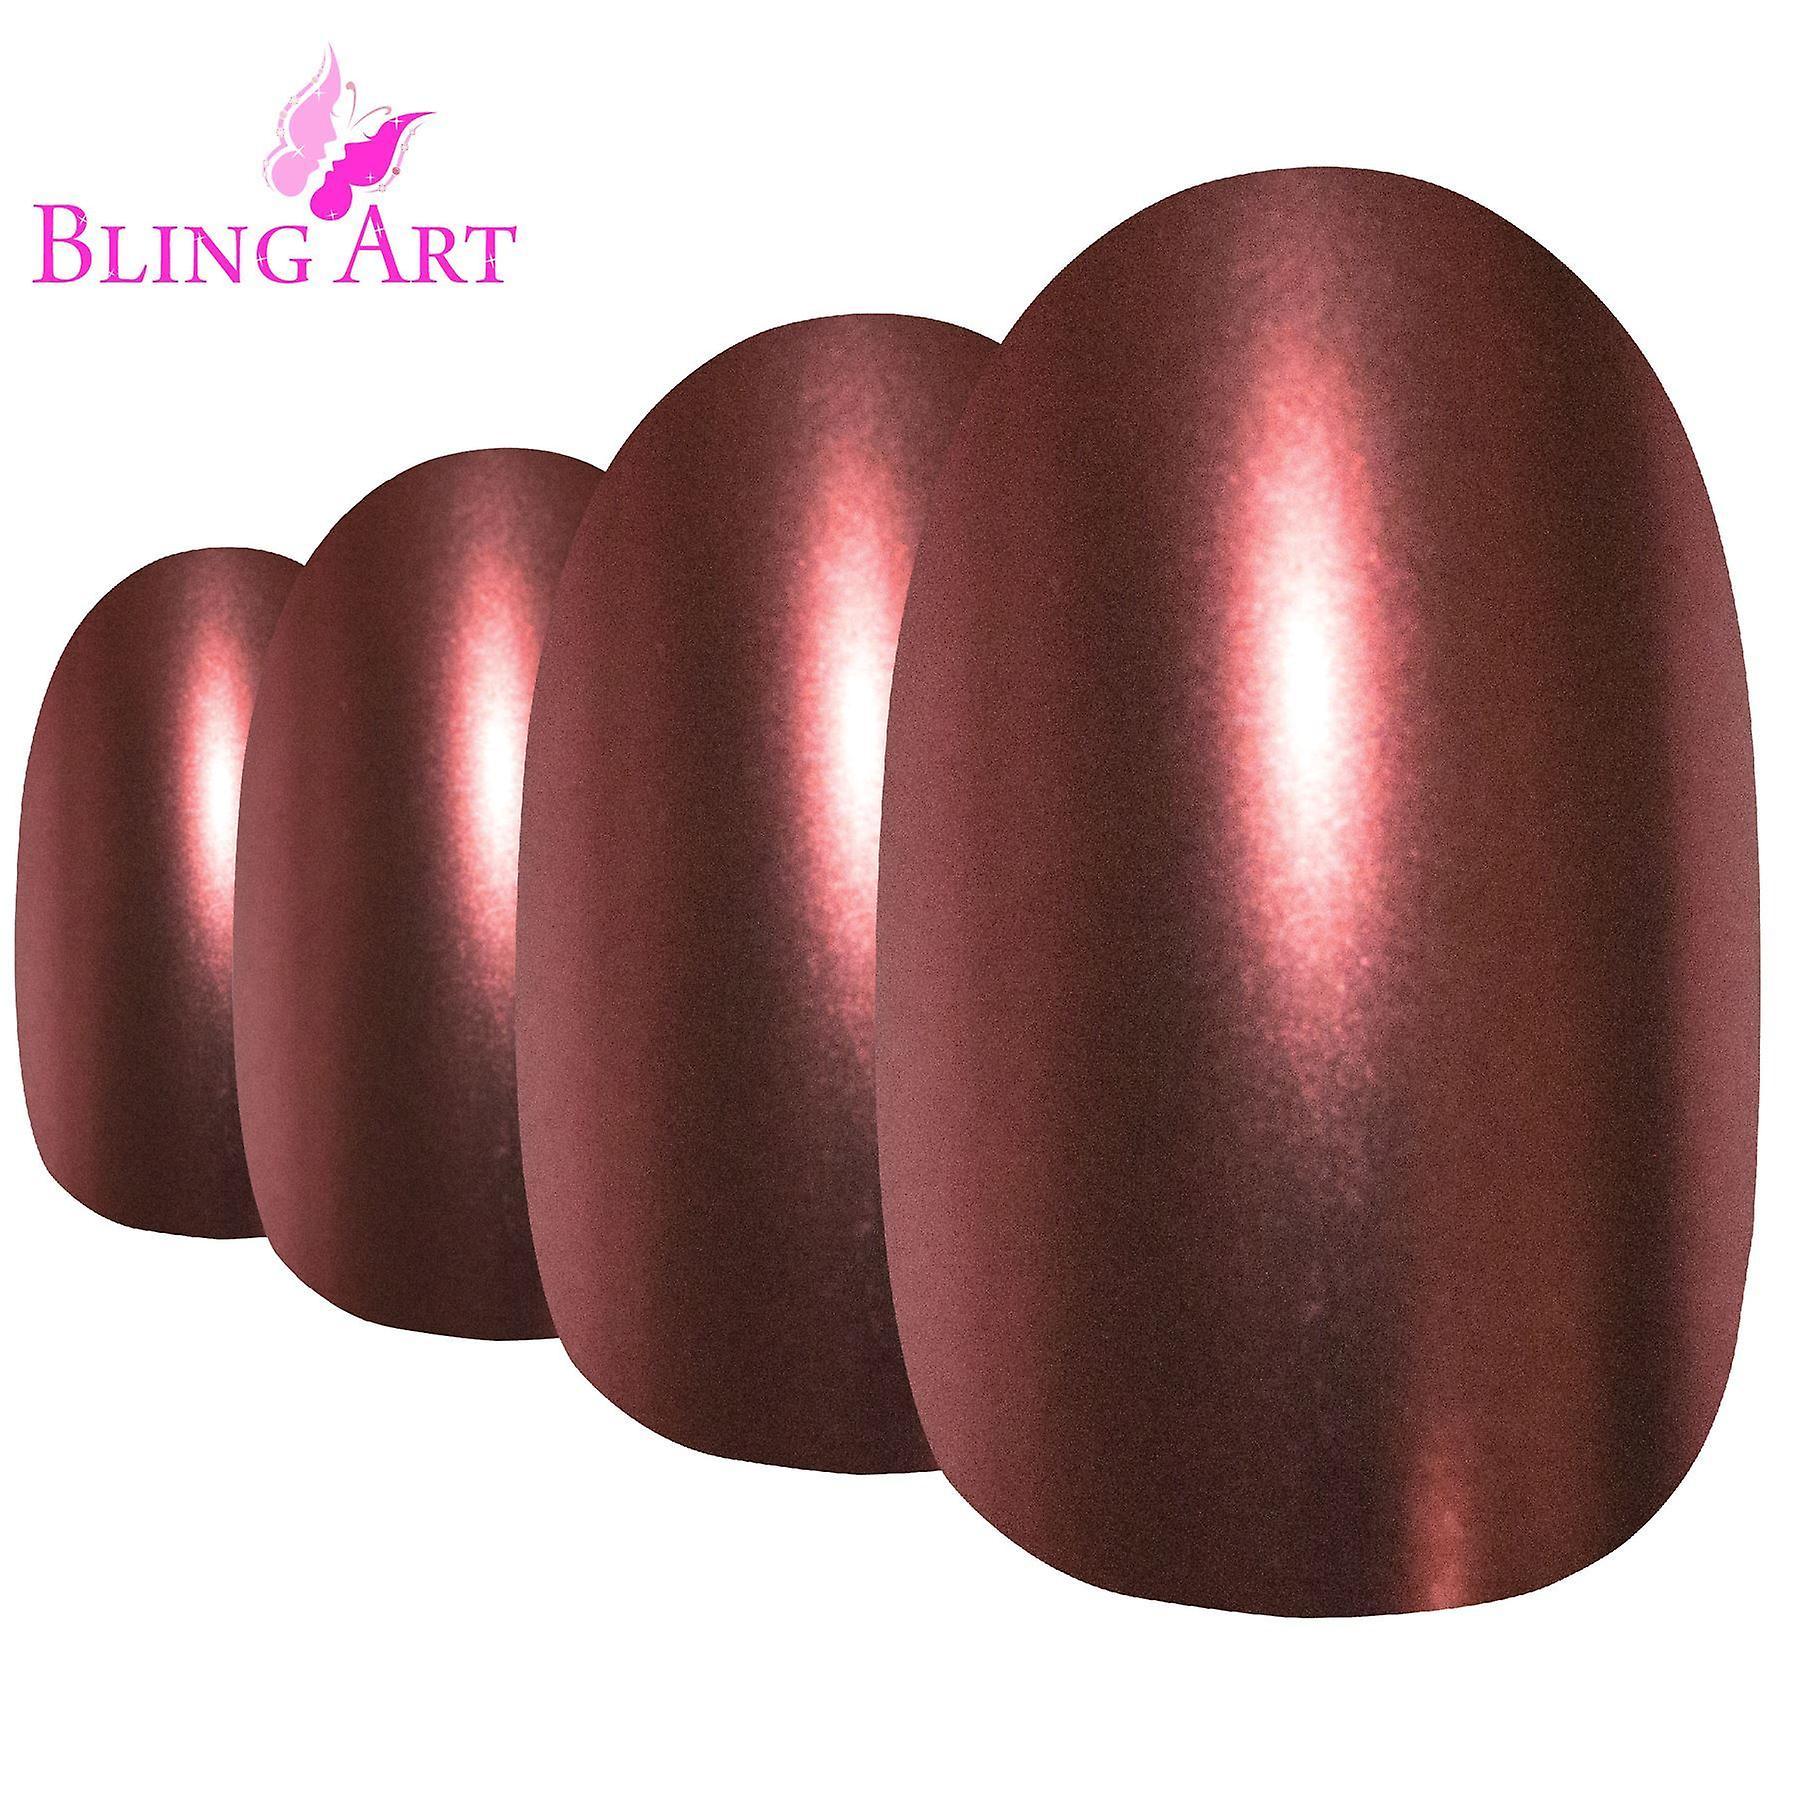 False nails by bling art brown matte metallic oval medium fake acrylic tips glue